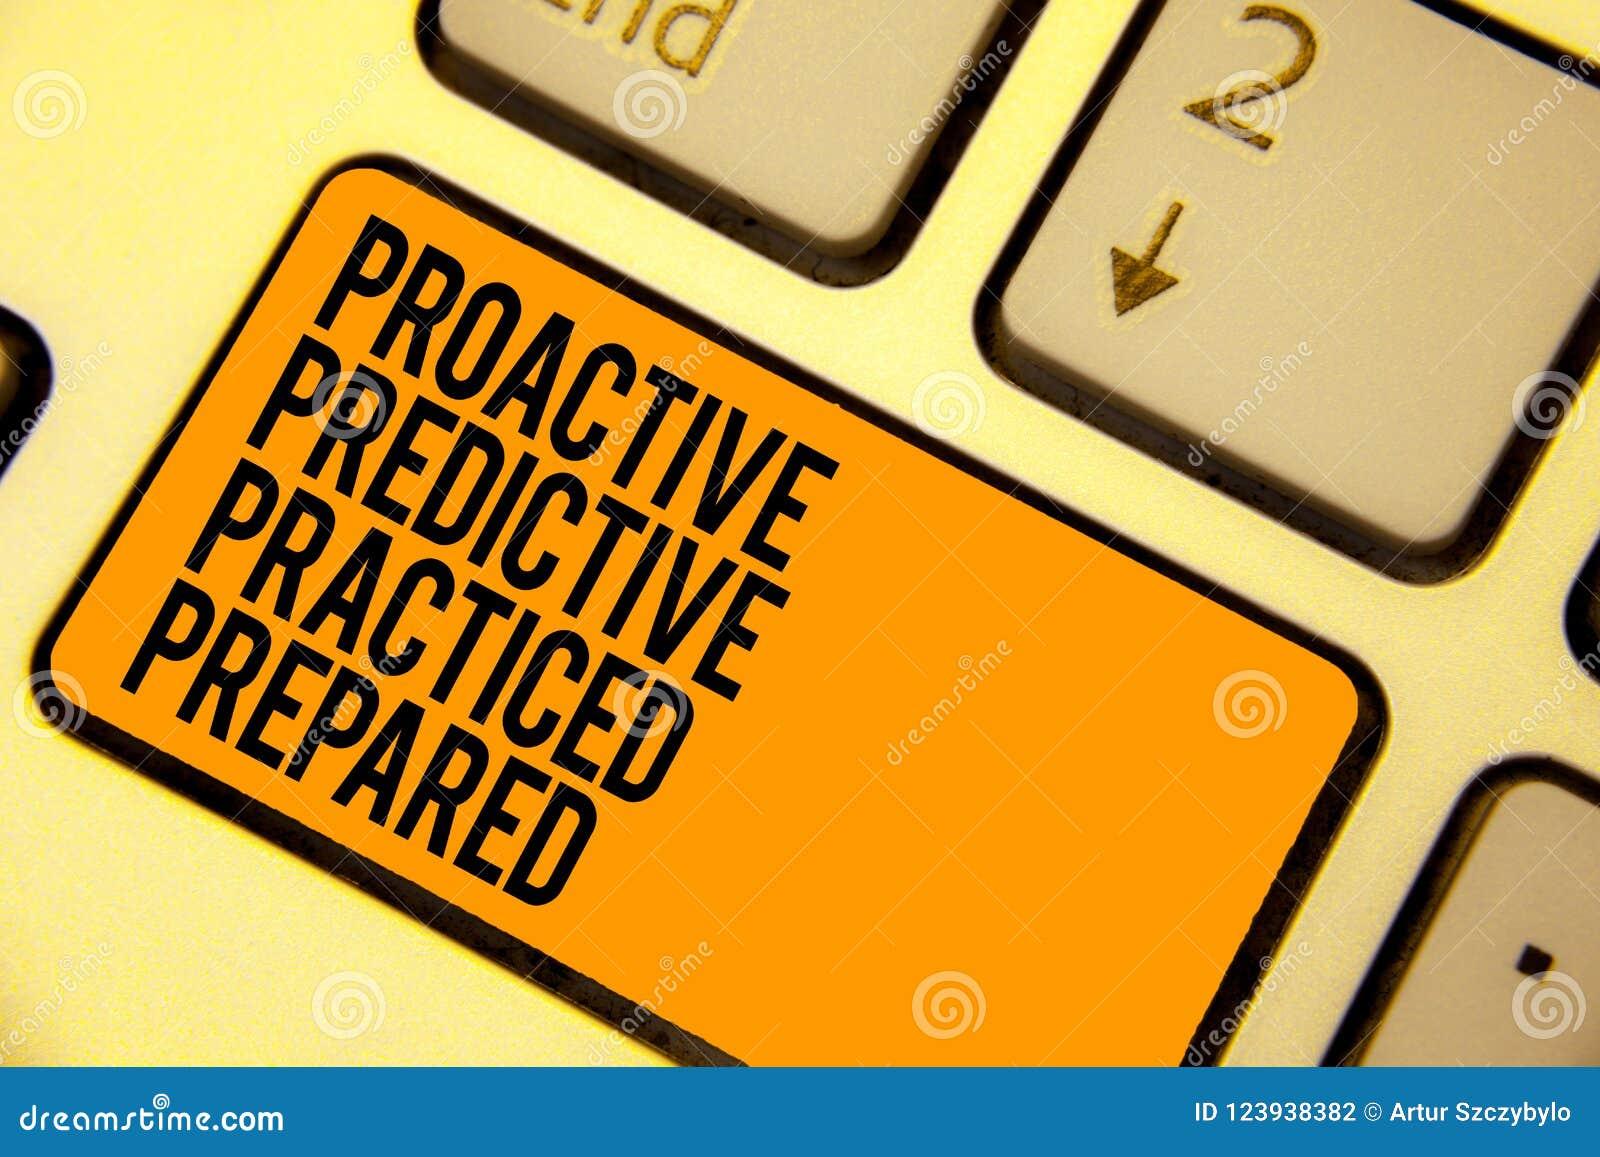 Handwriting Text Writing Proactive Predictive Practiced